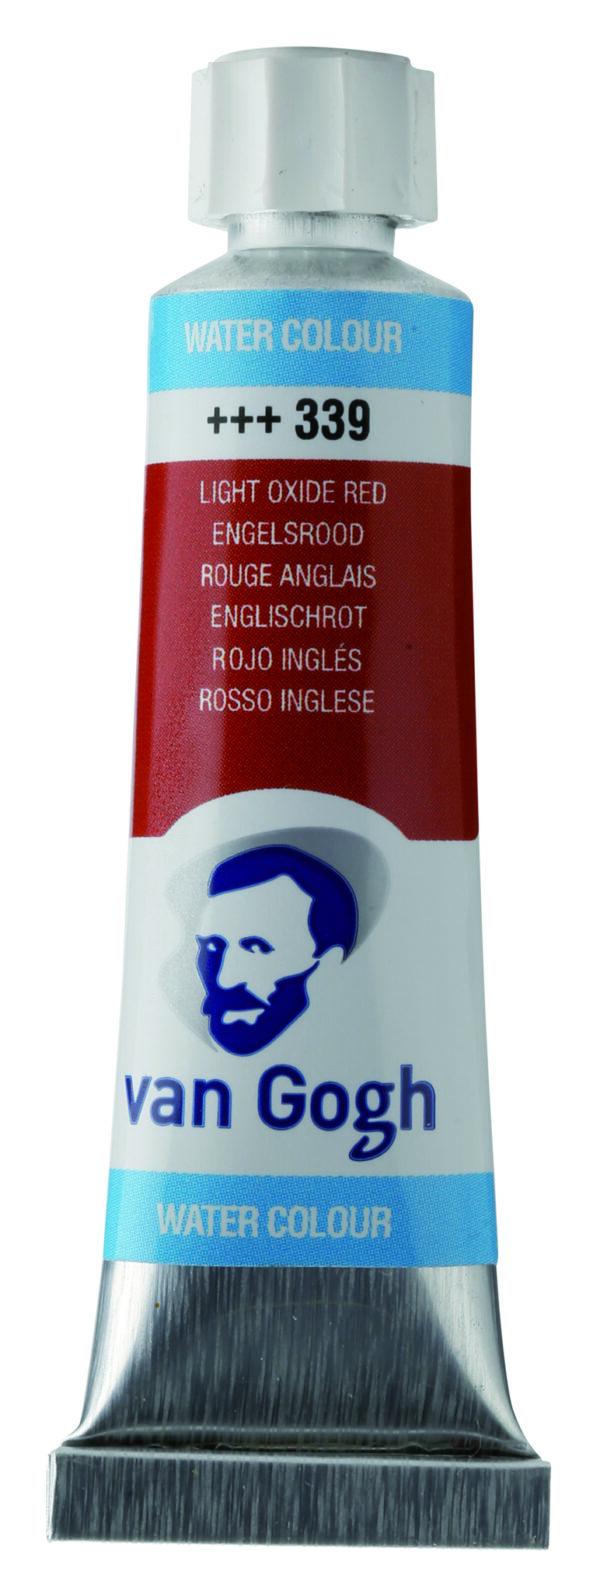 Van Gogh 339 Light oxide red - 10 ml